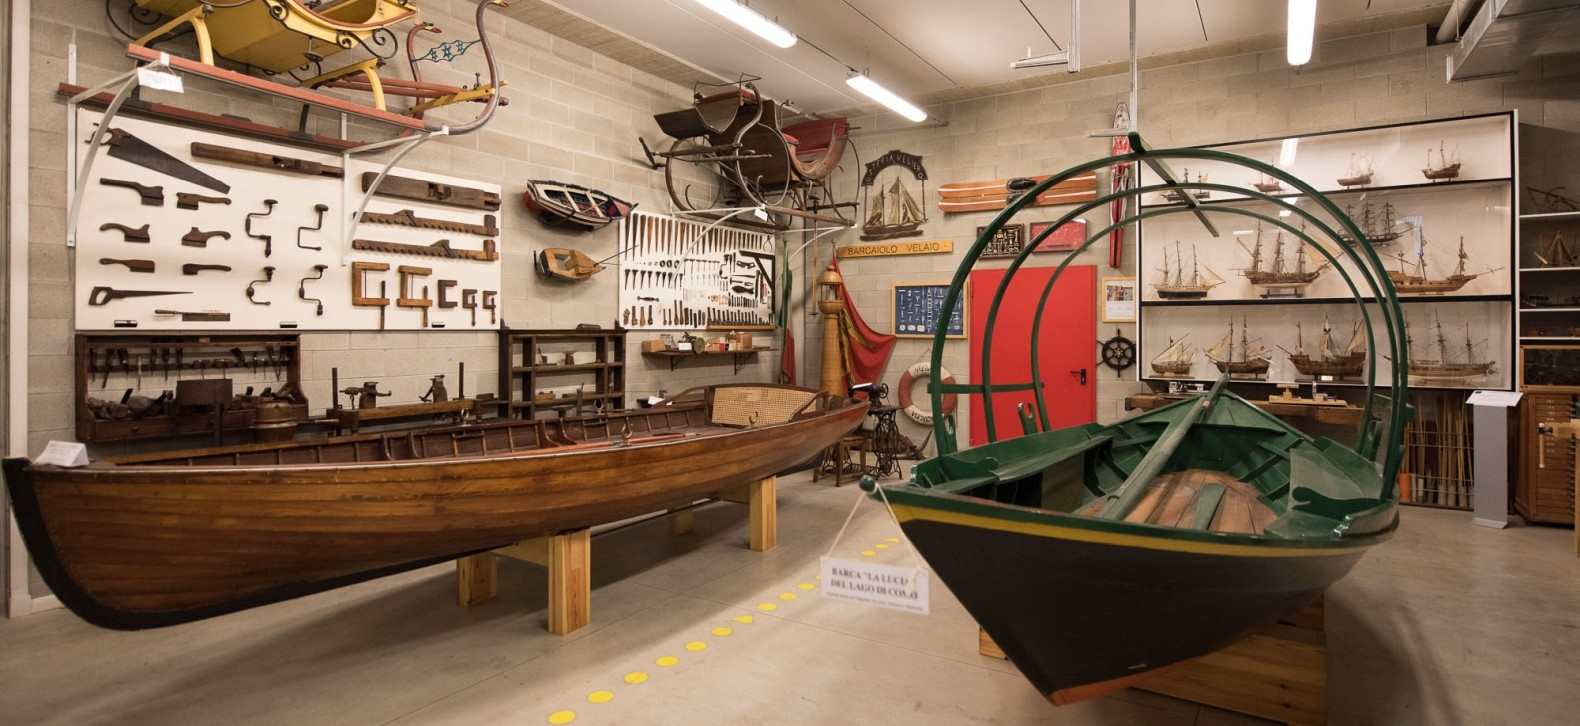 Museo Del Falegname Tino Sana Visit Bergamo